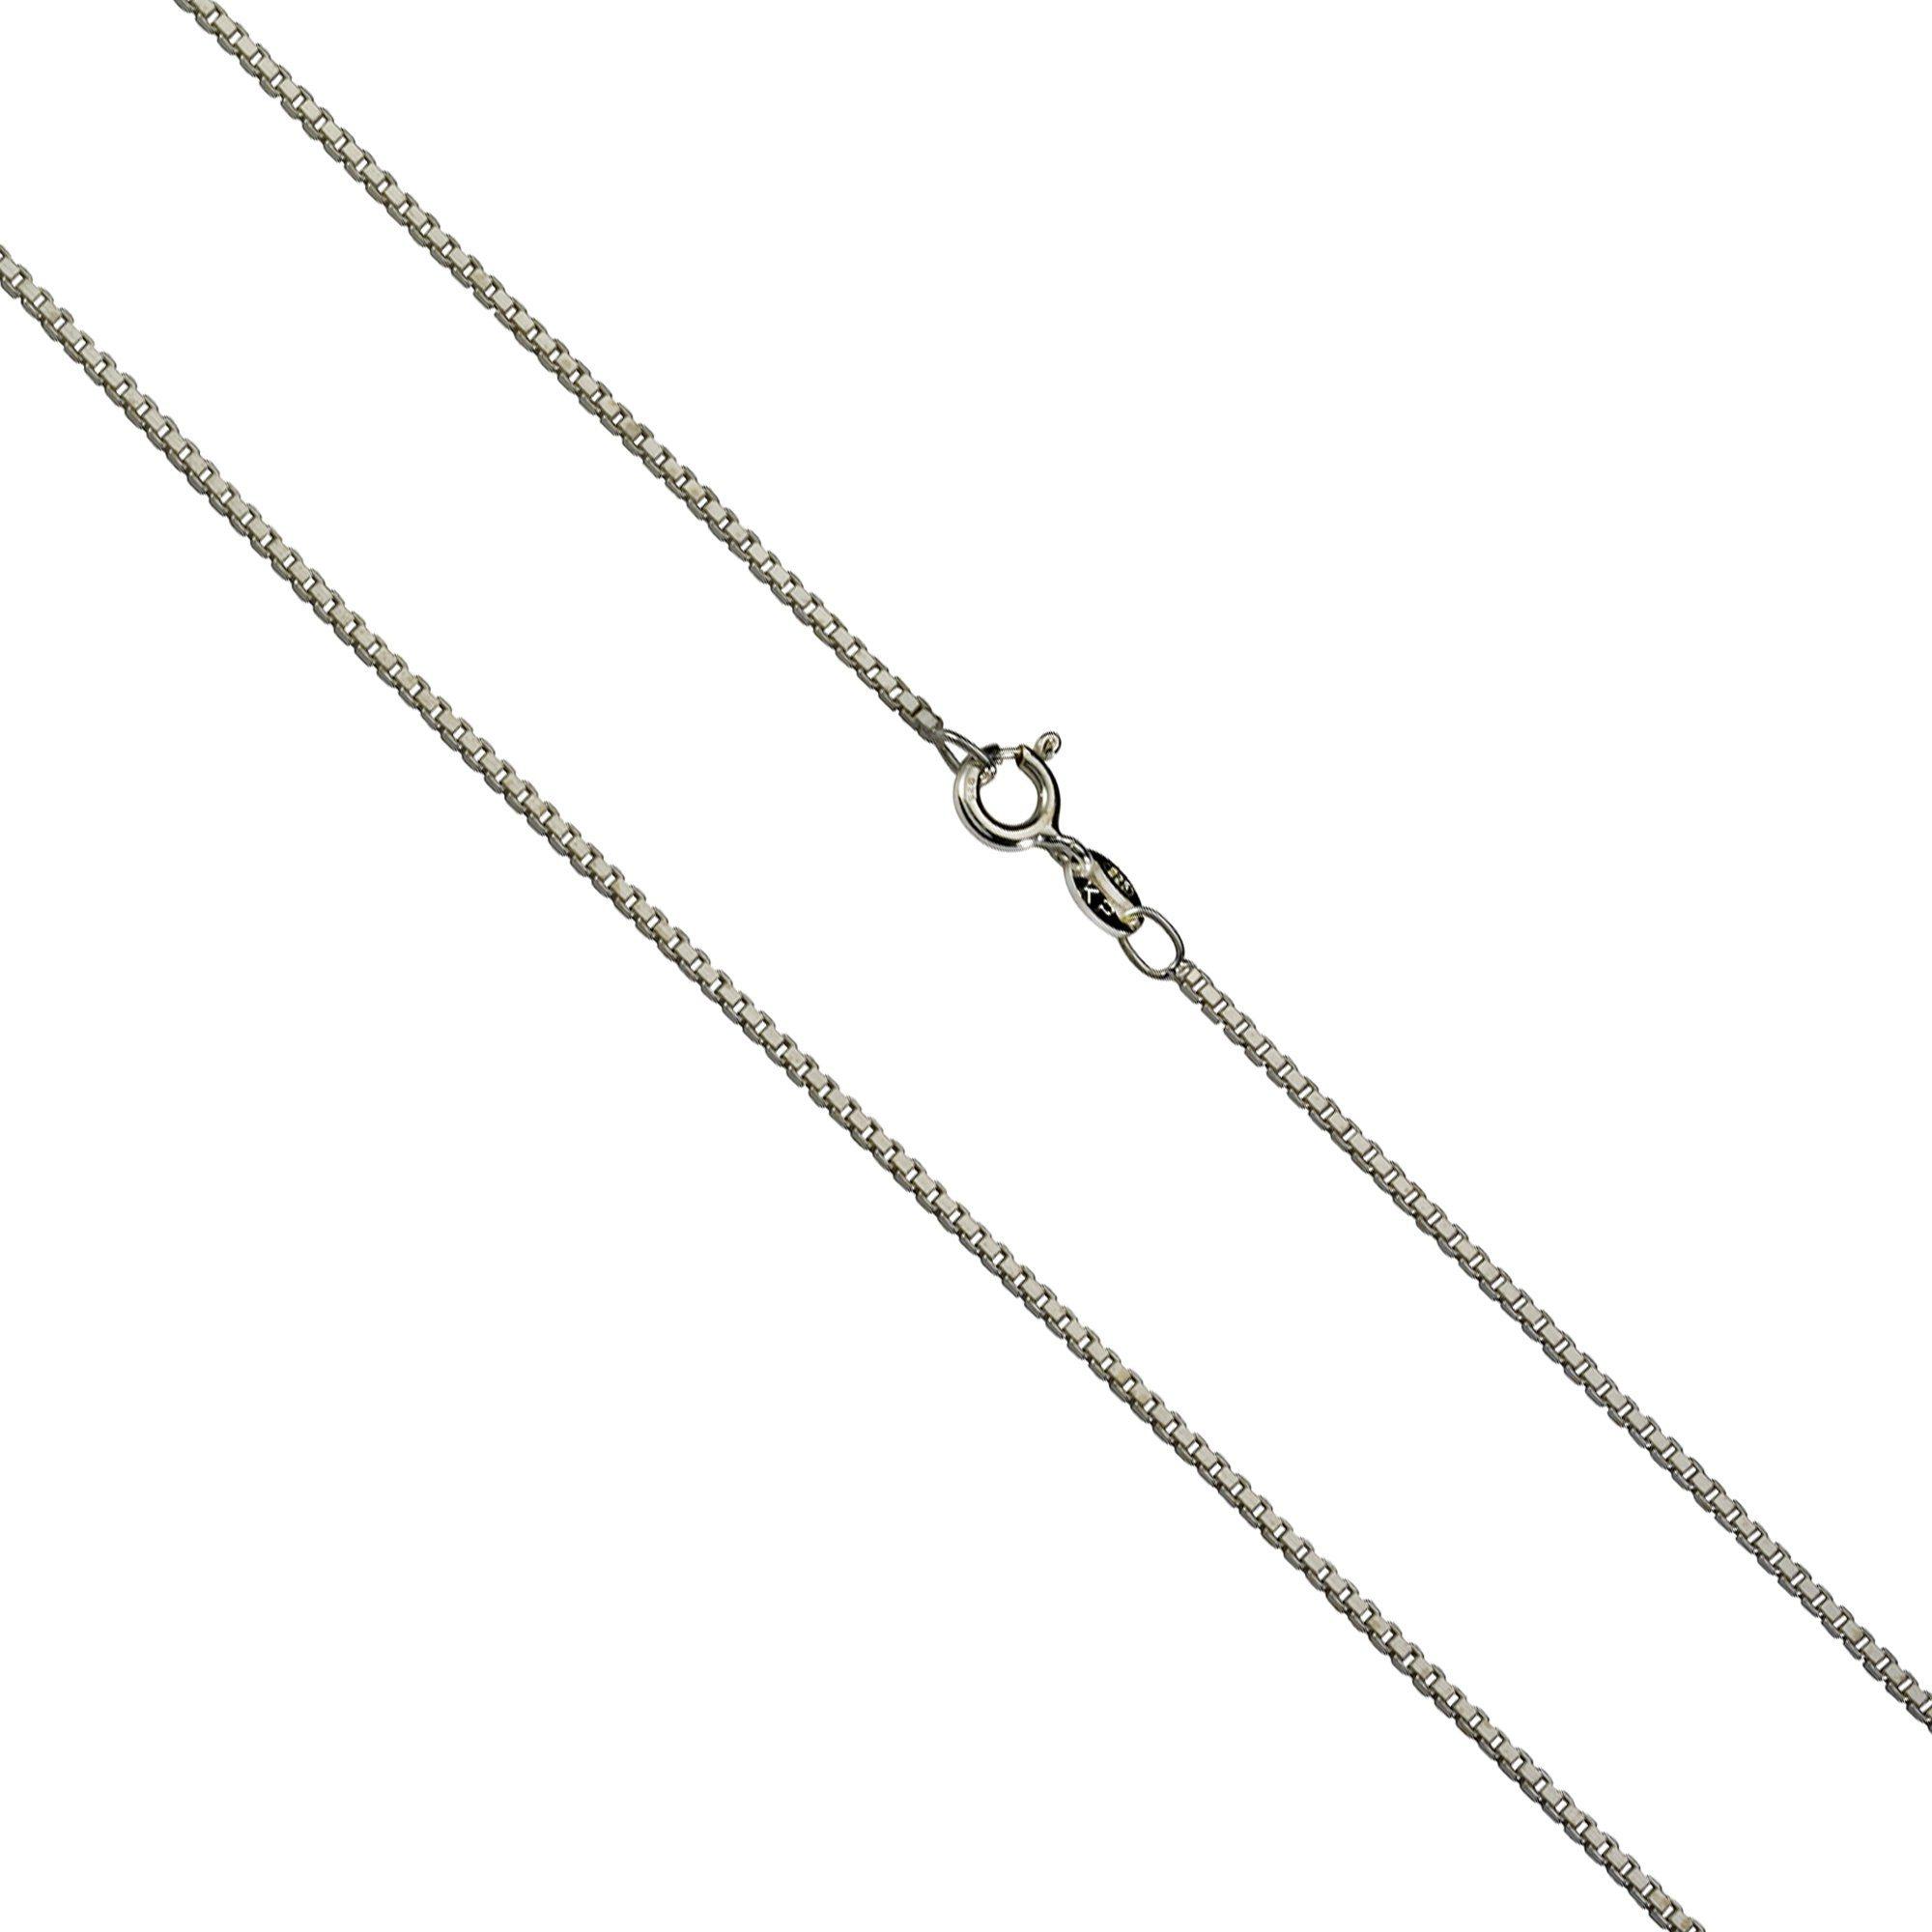 Firetti Collier »925/- Sterling Silber rhod. Veneziakette«   Schmuck > Halsketten > Silberketten   Silber   Firetti